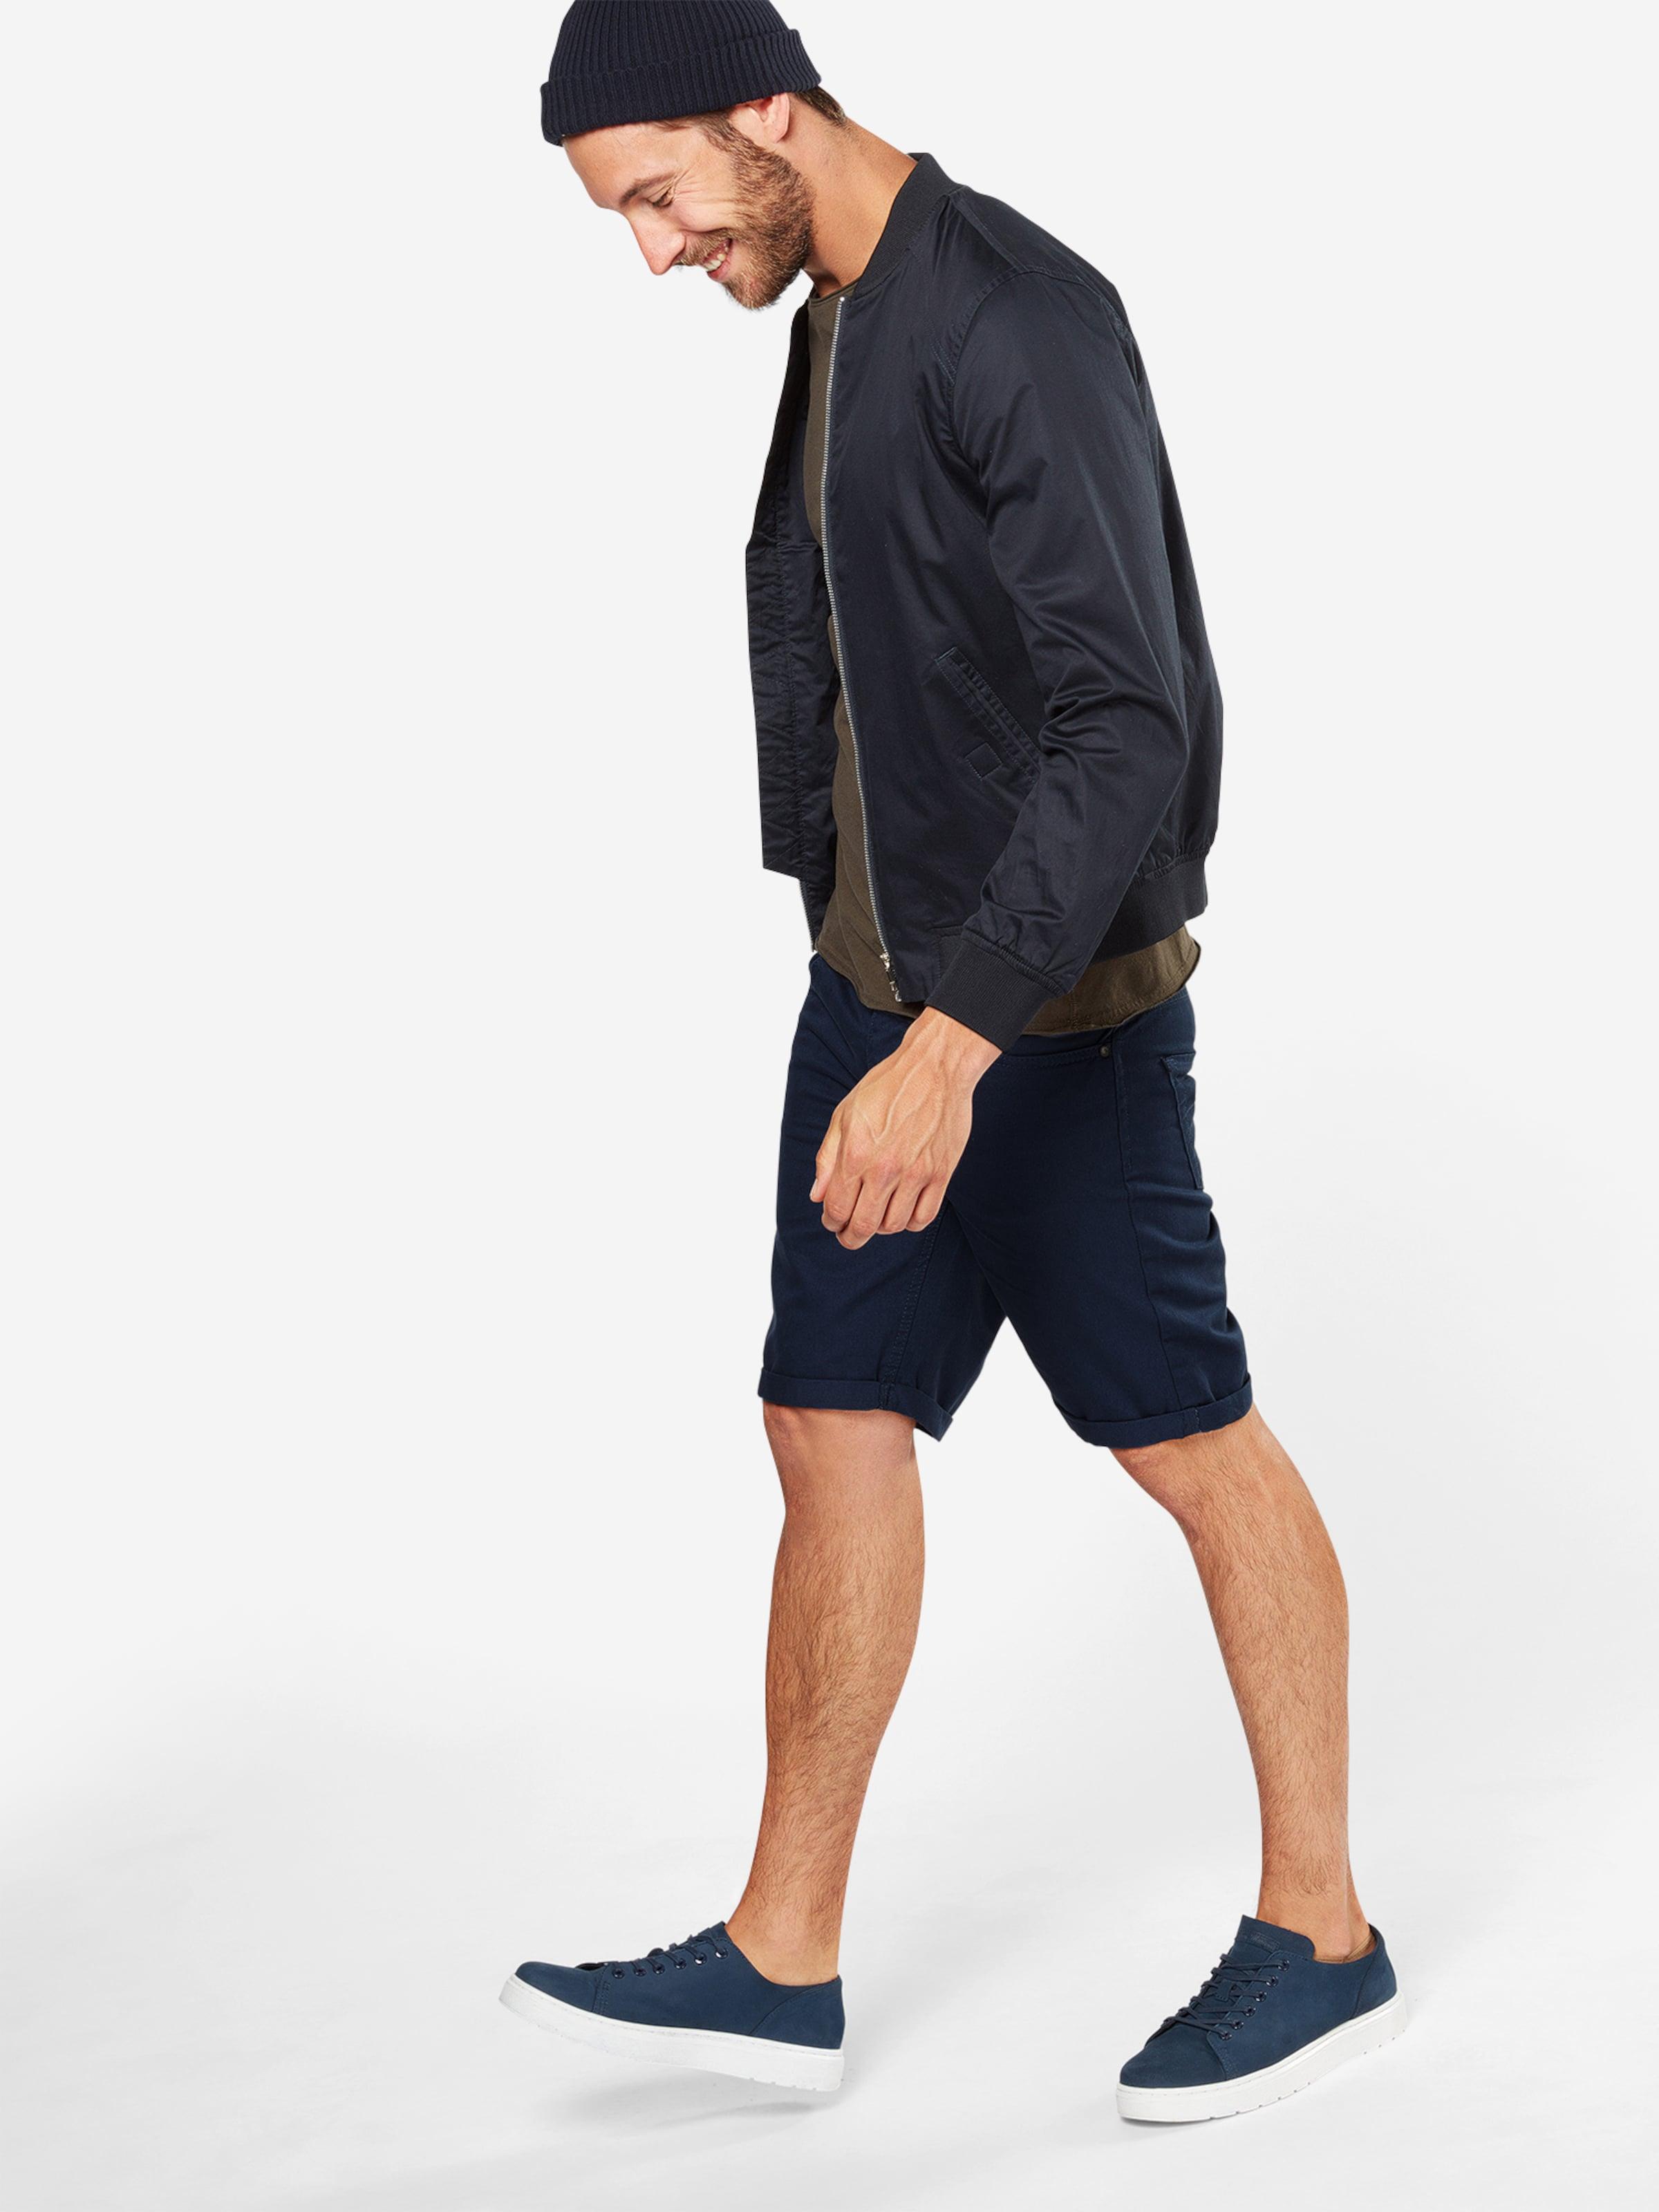 Spielraum Footlocker Bilder Only & Sons Shorts 'Loom Twill shorts' Perfekte Online Billige Eastbay Outlet Neueste 6elaNtl